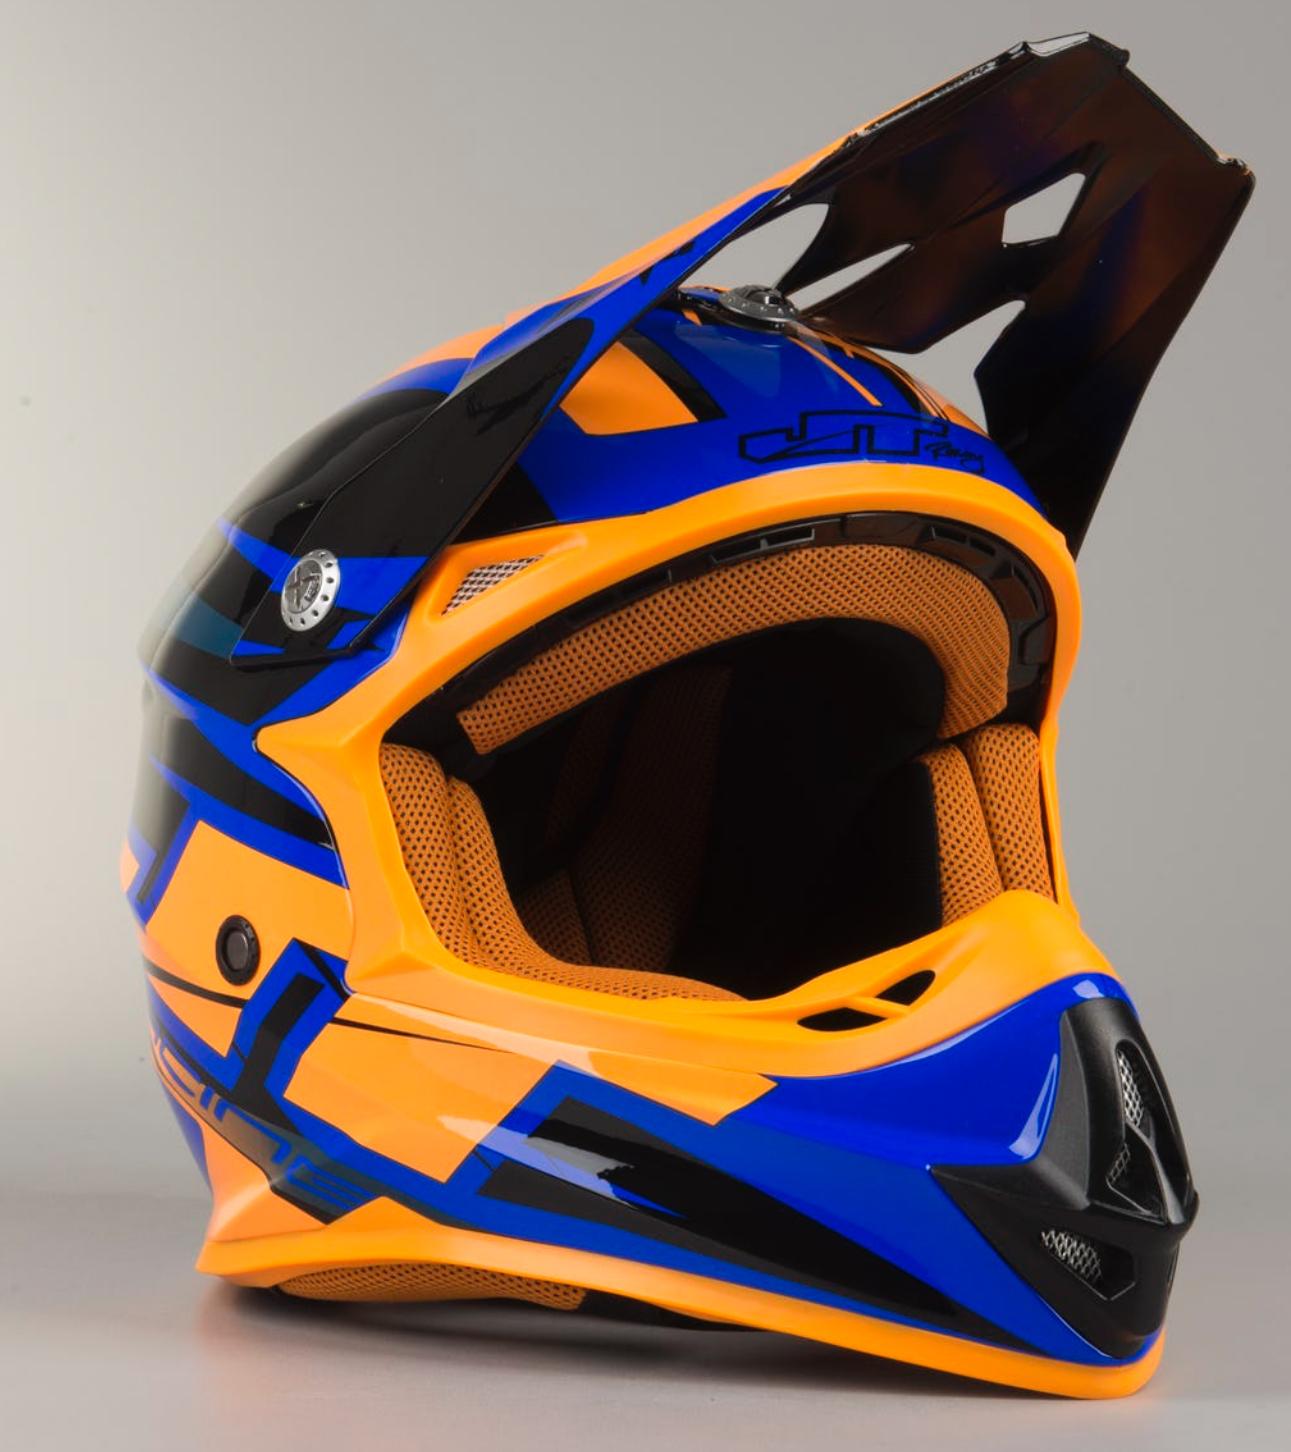 Casco de Cross JT Racing Prime Negro-Azul-Naranja